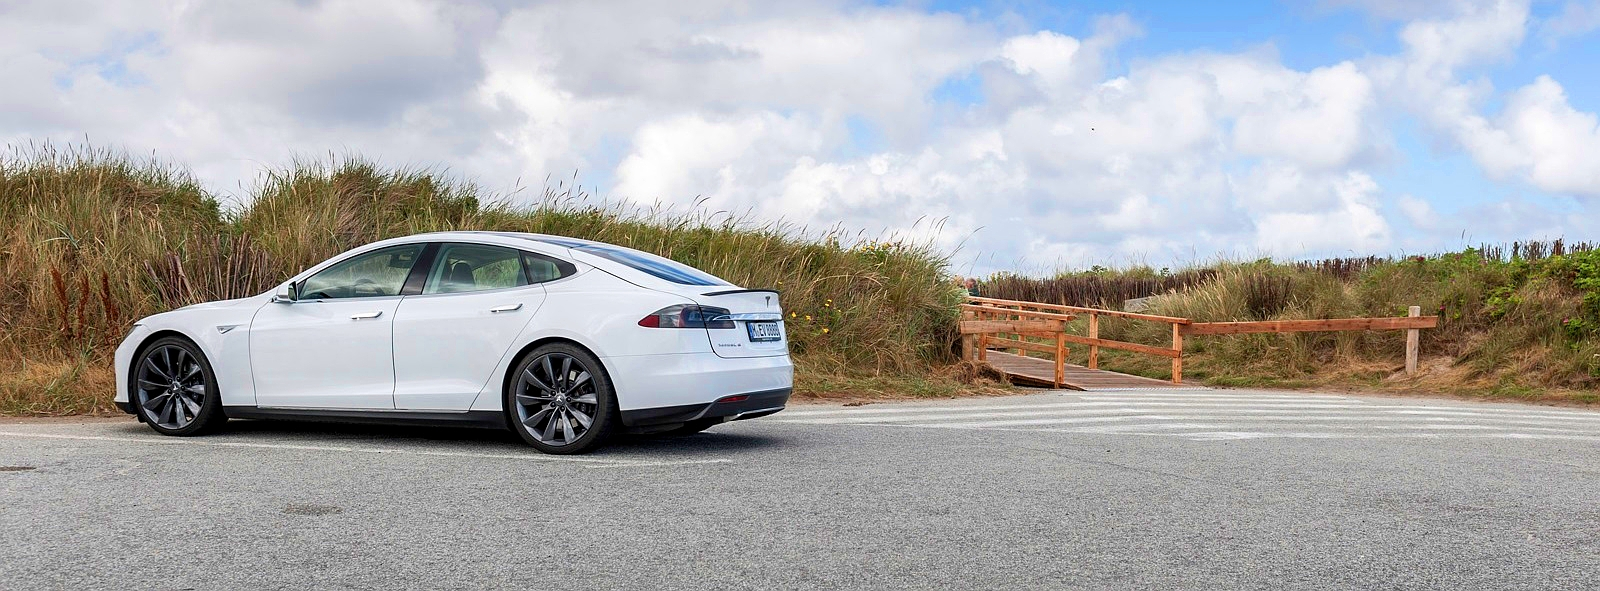 Tesla Model-S набирает обороты